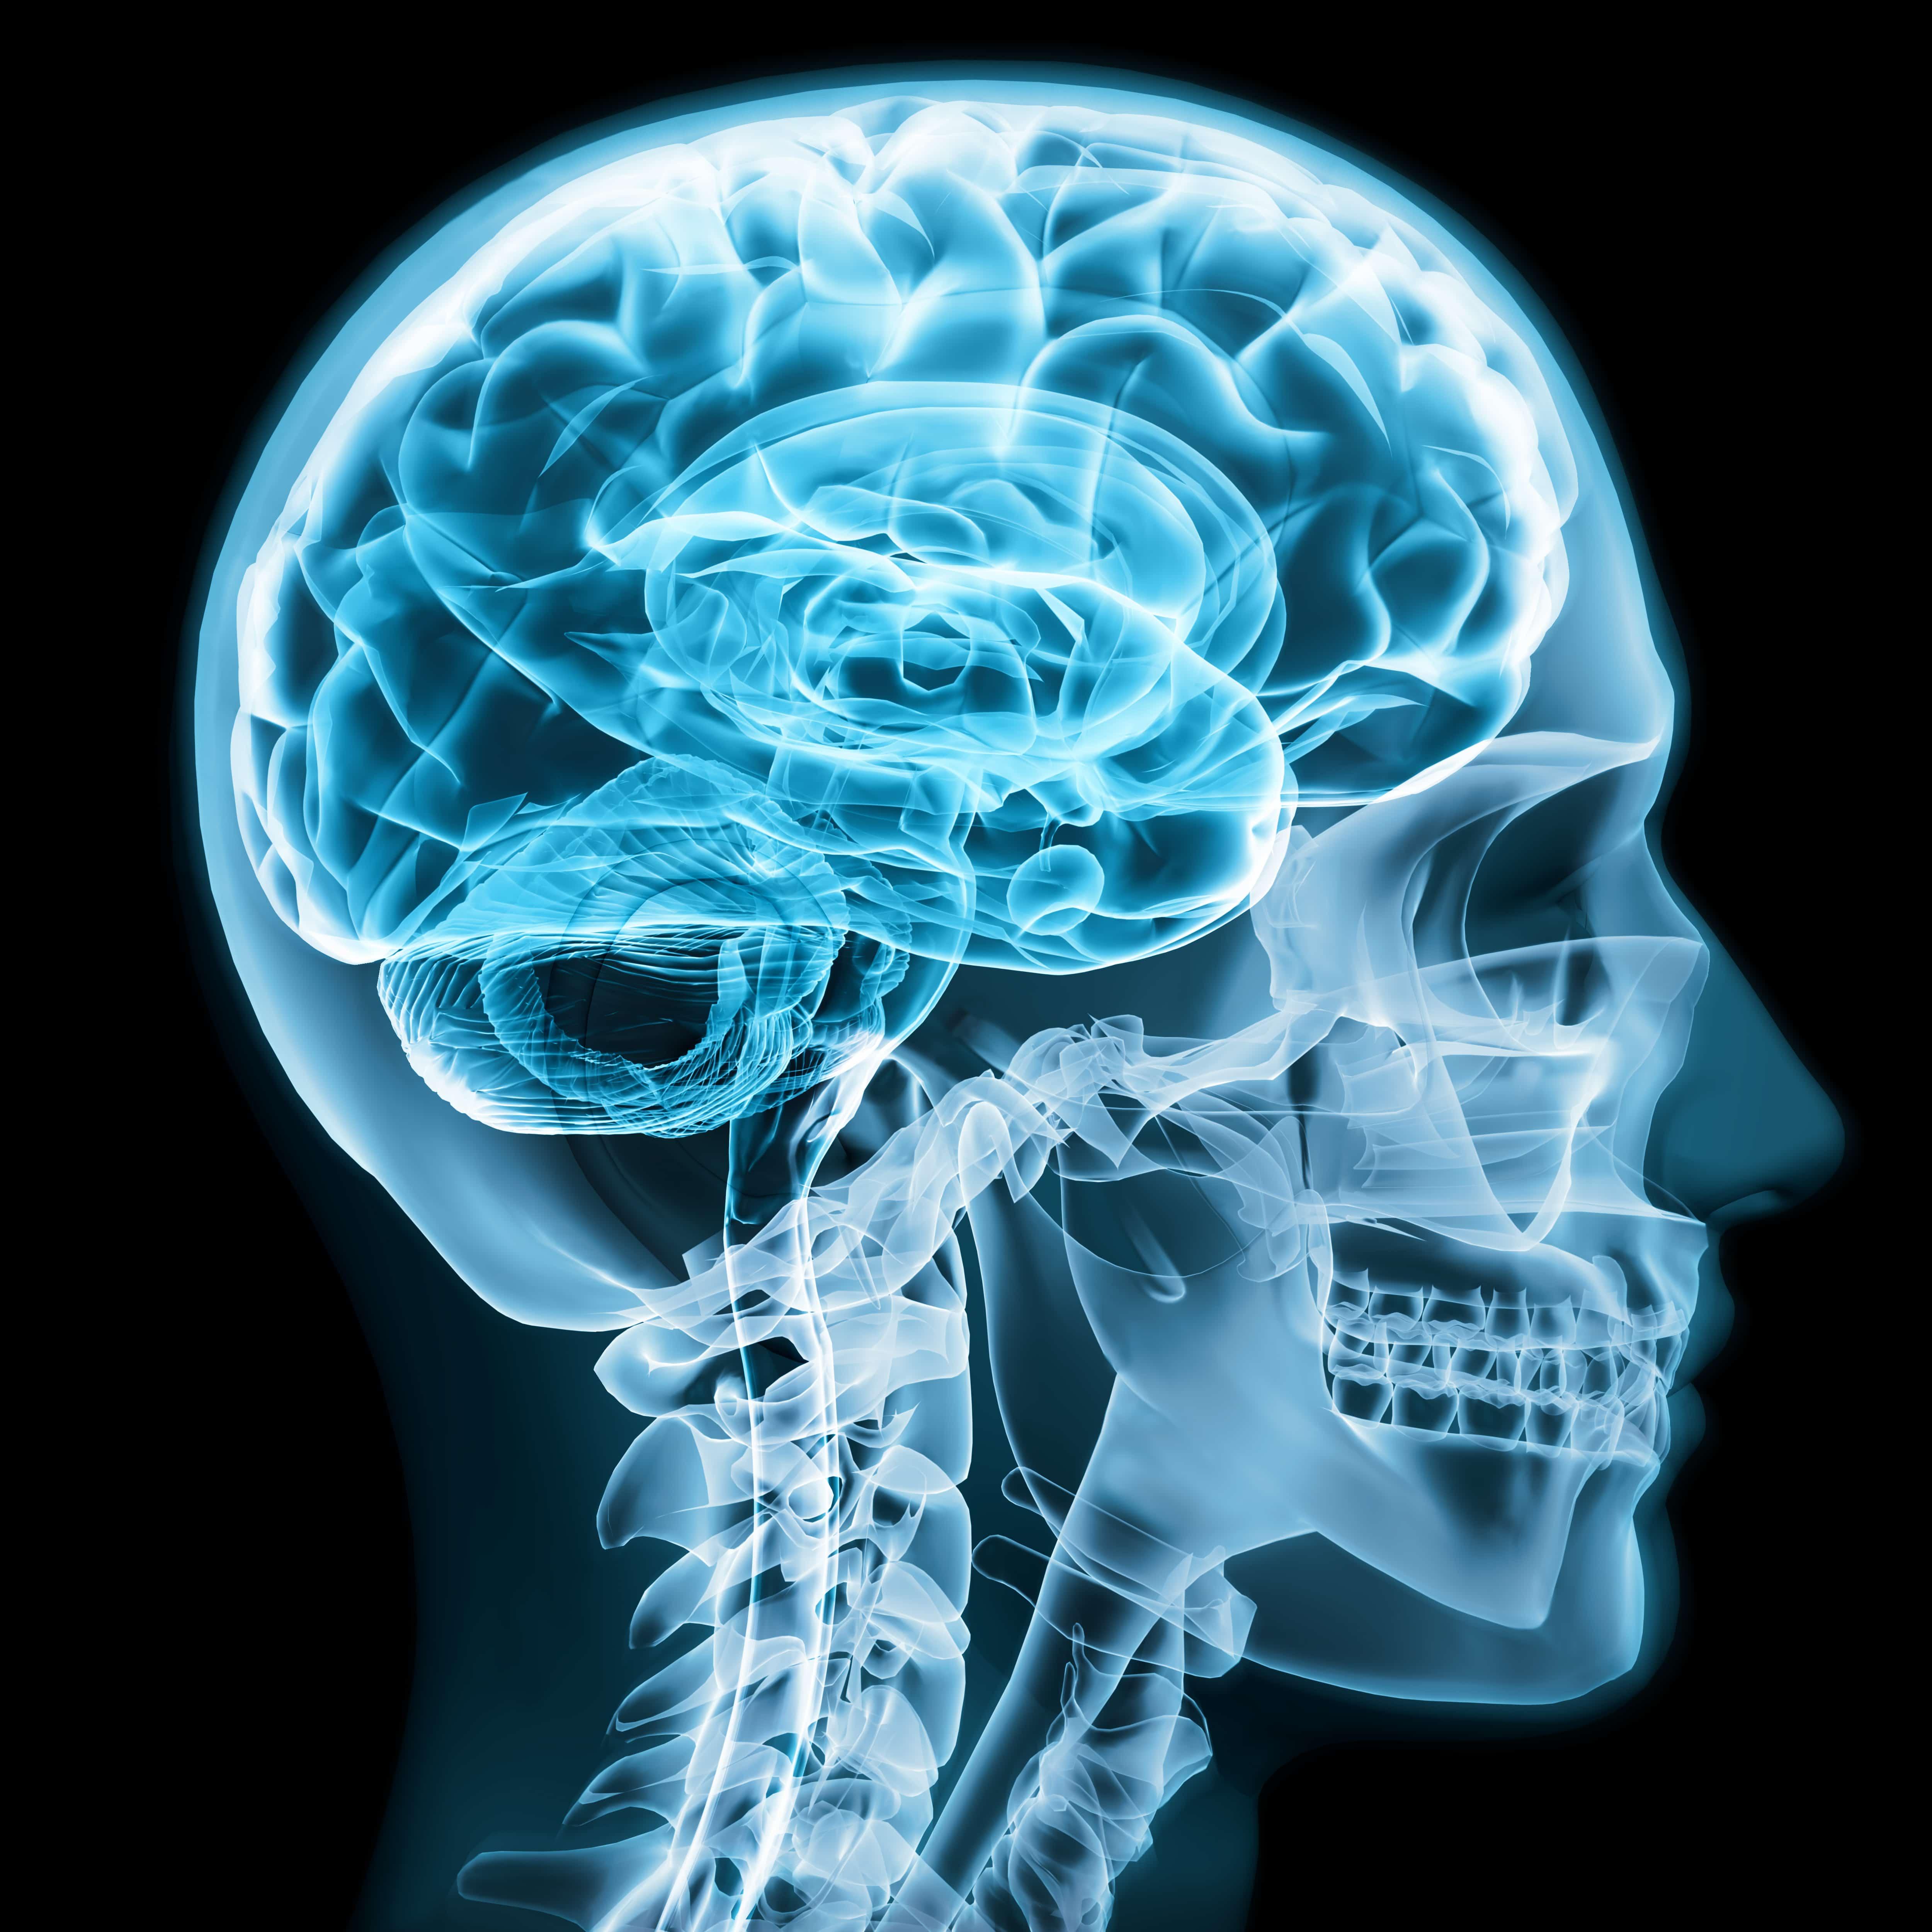 X-ray of brain showing brain activity